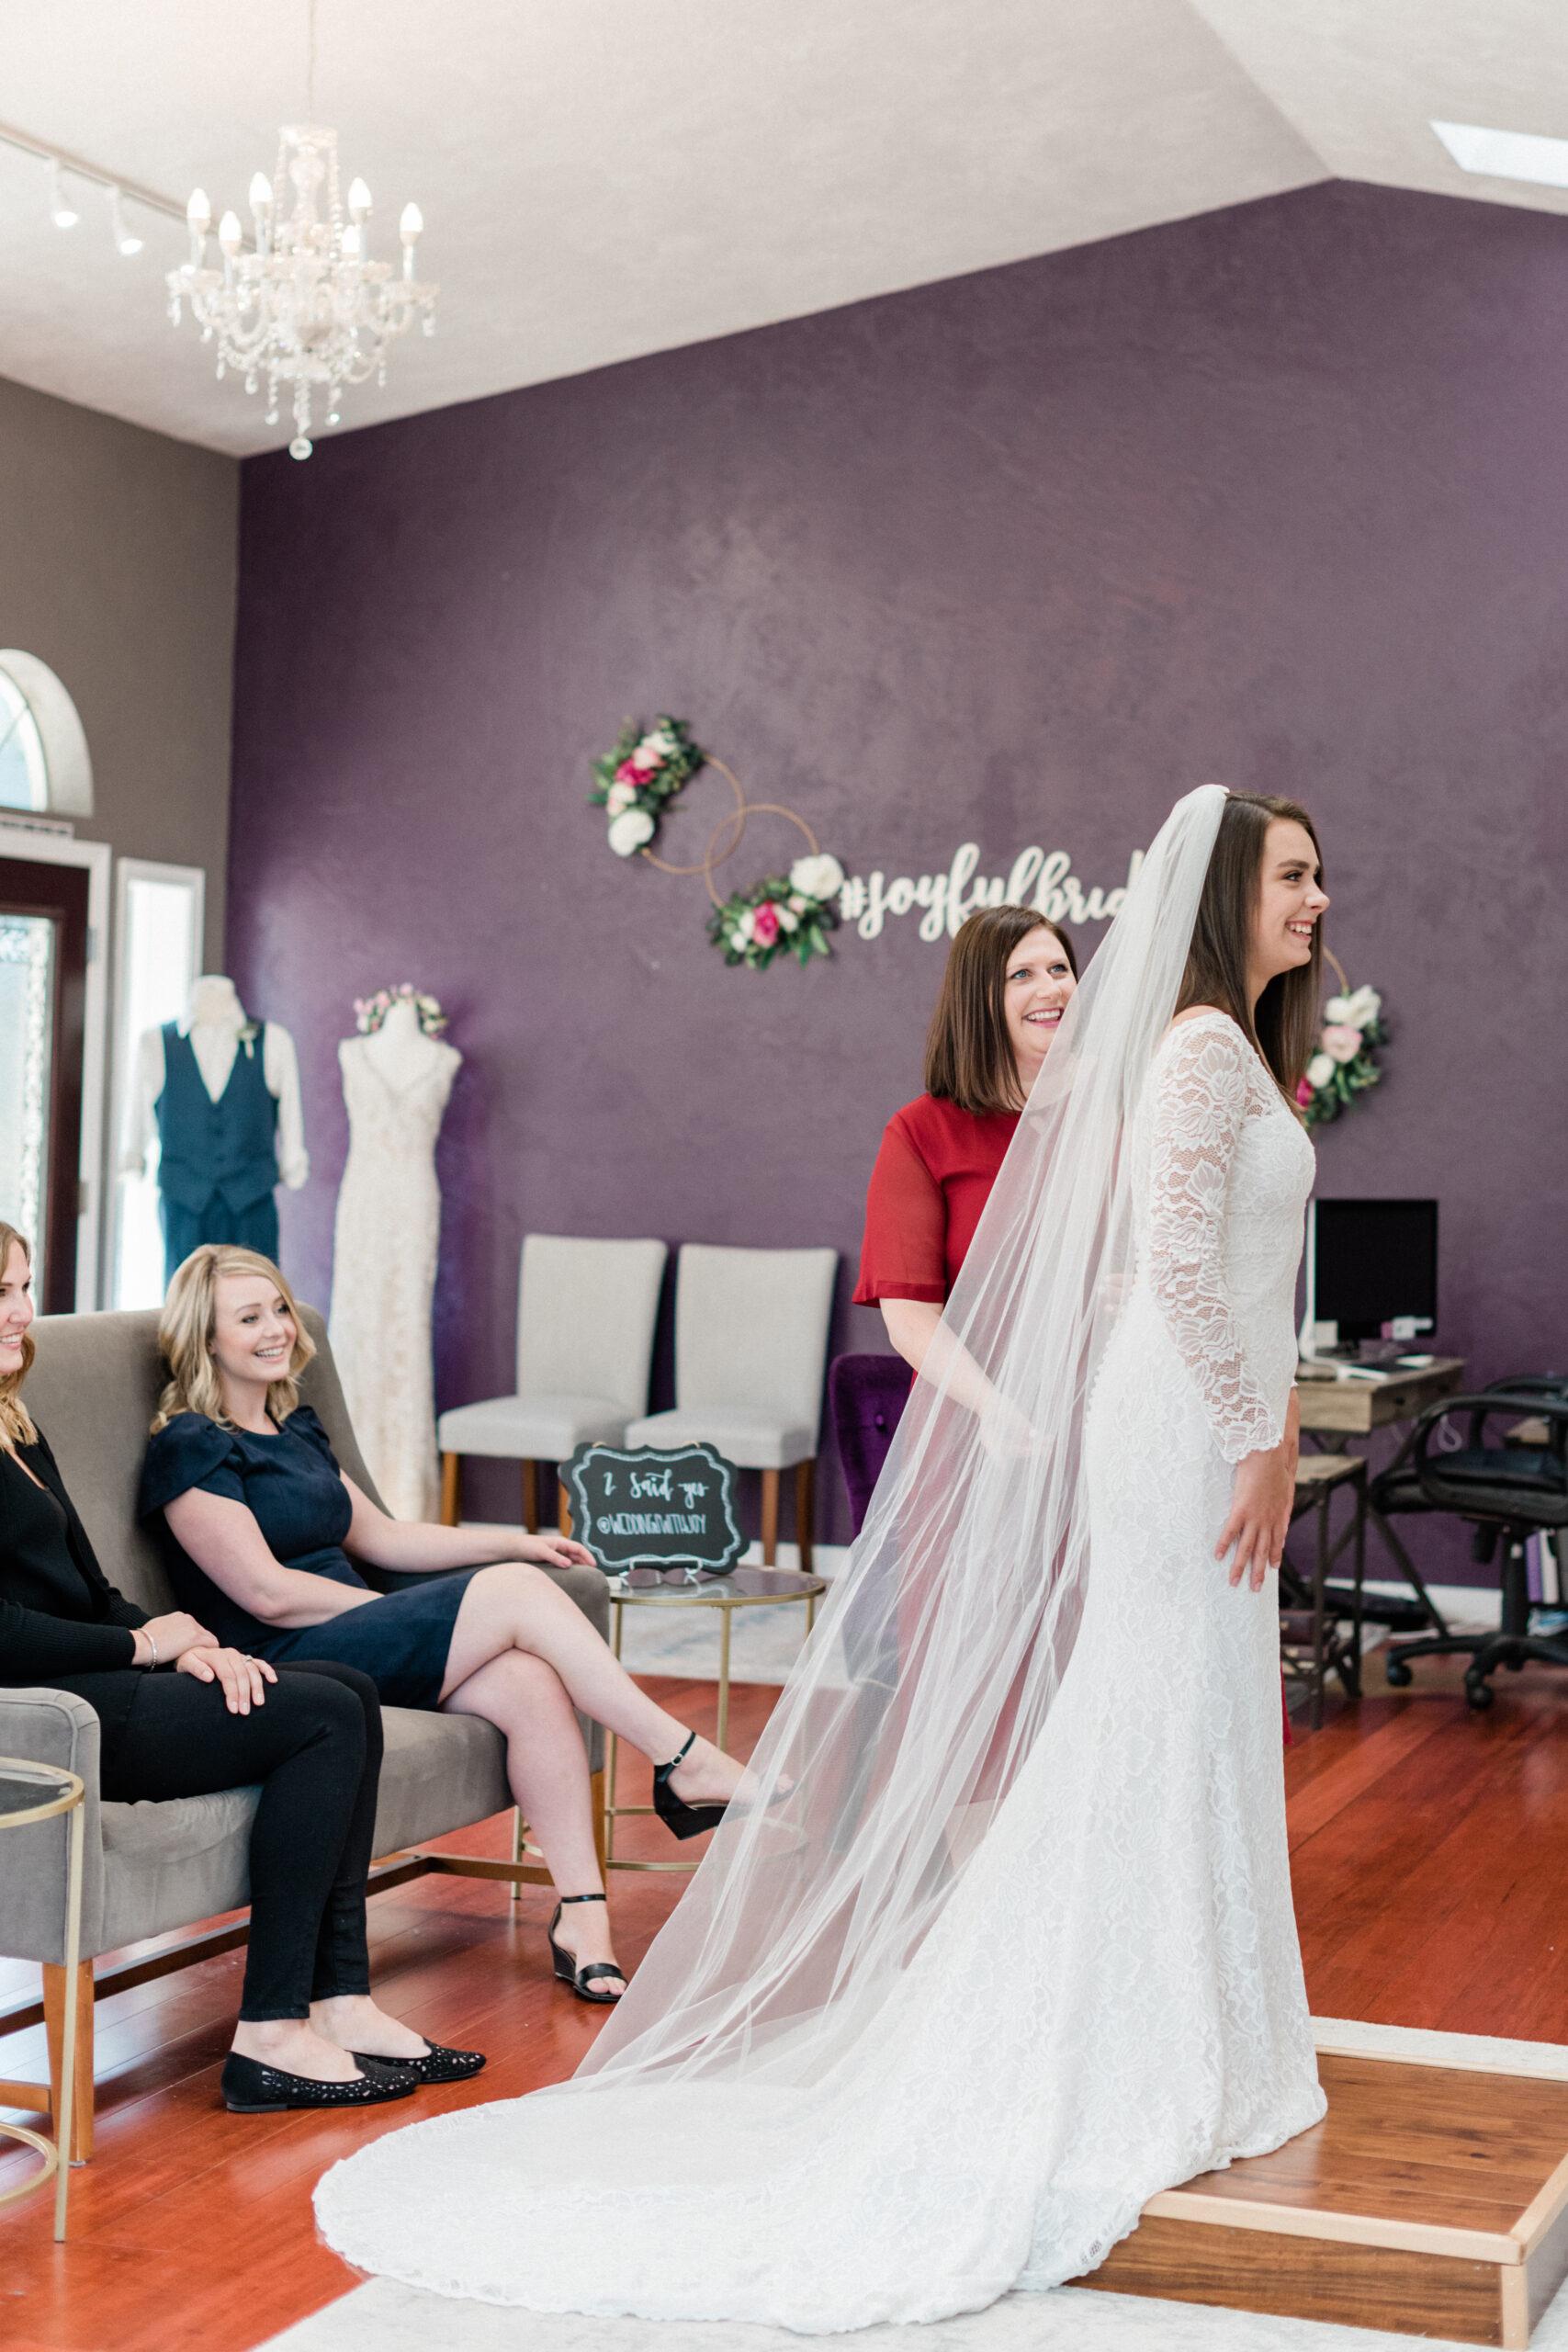 Wedding dress boutique shop owner.